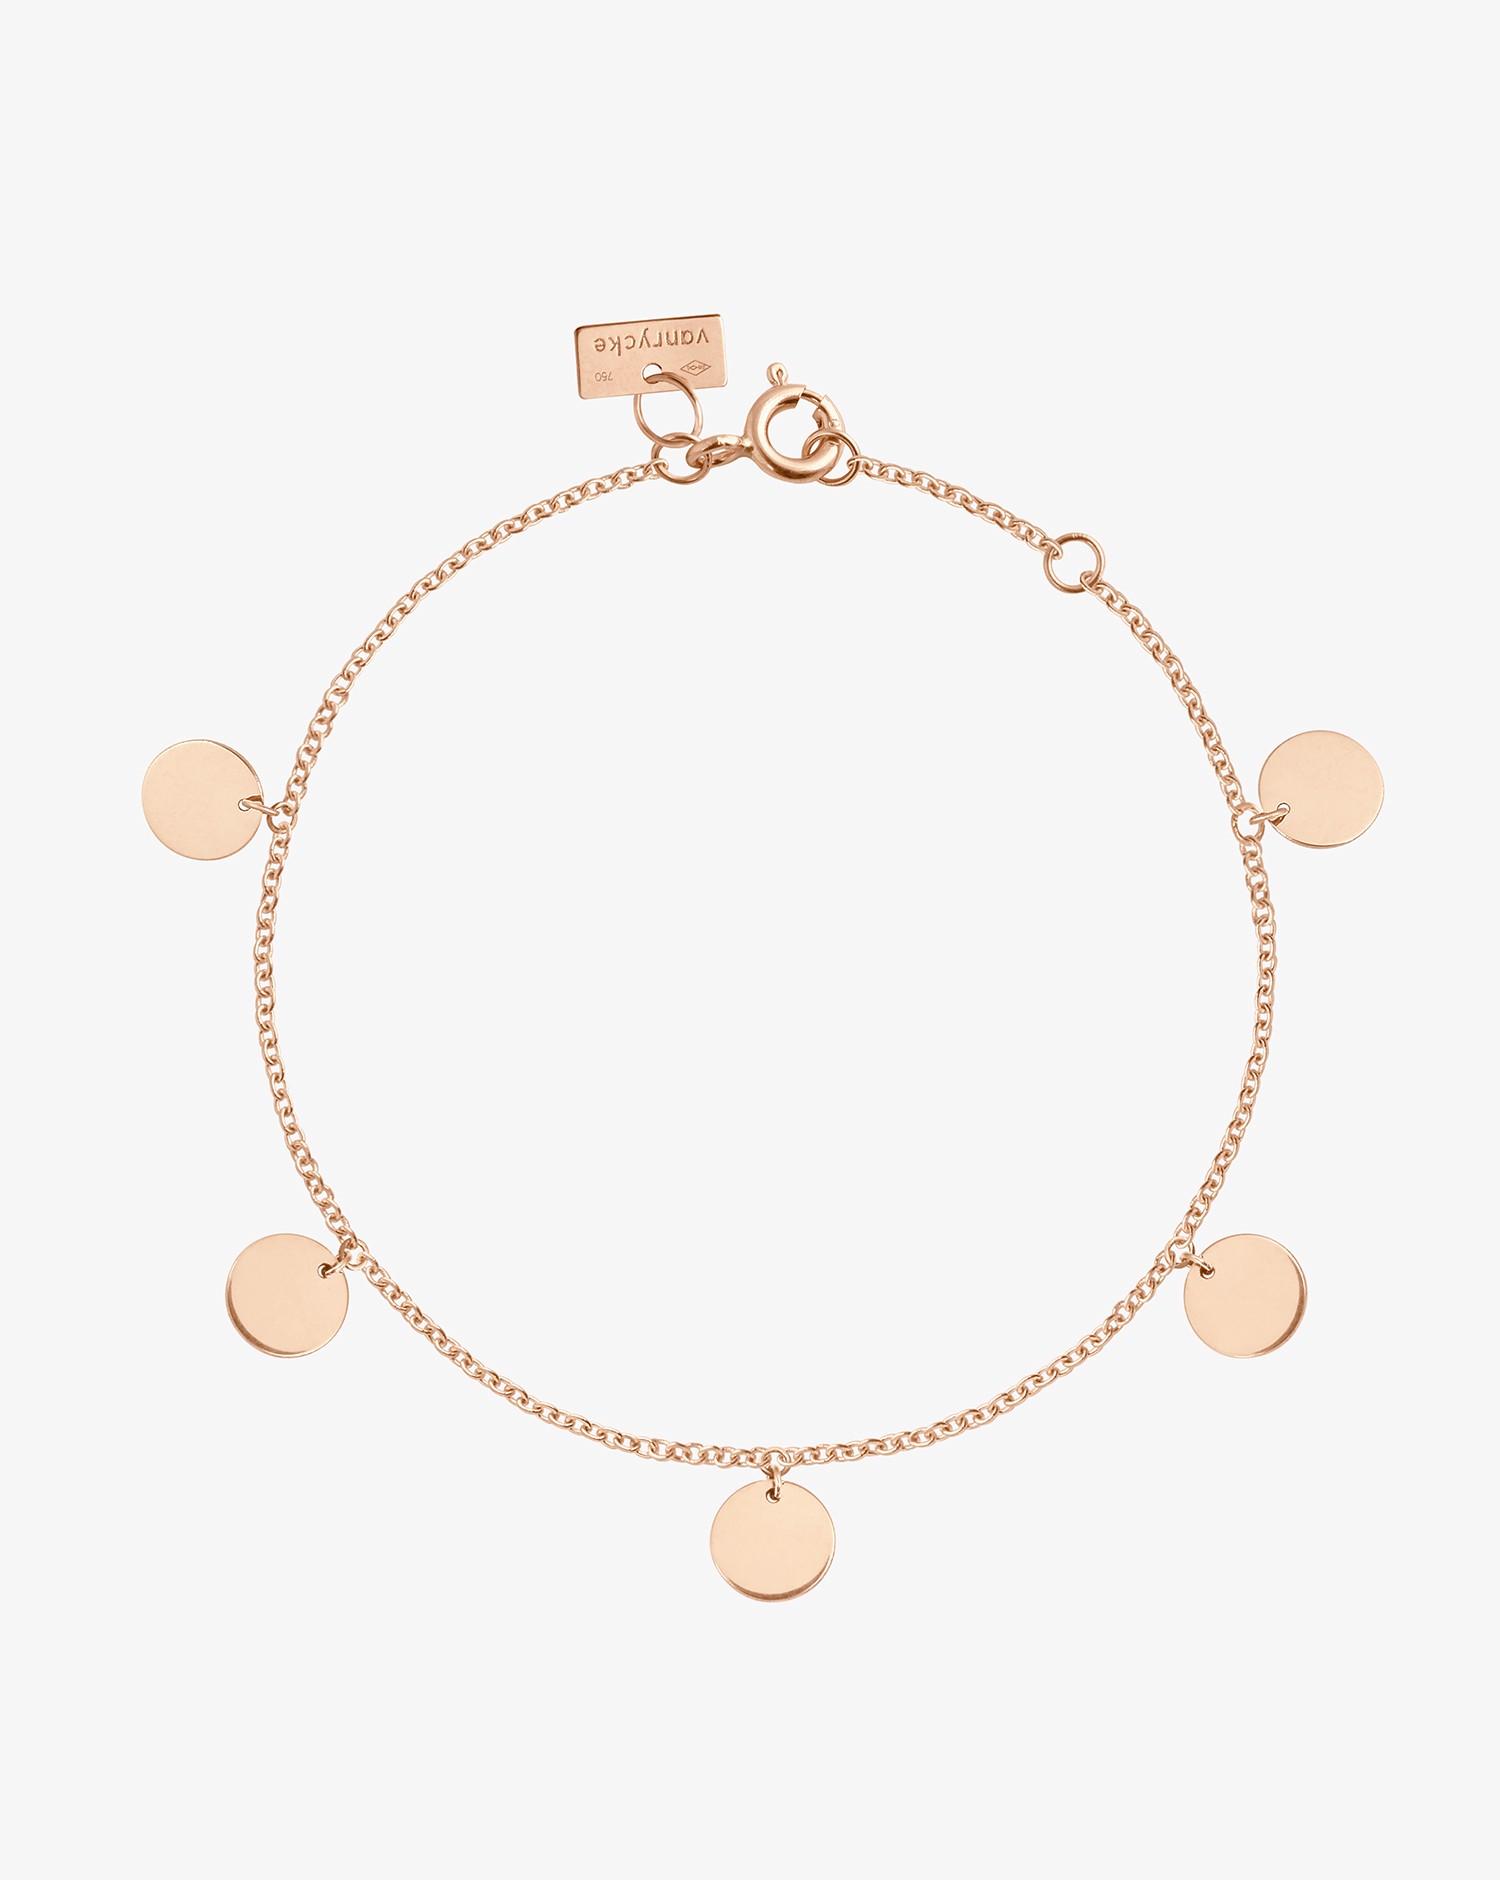 Armband Marrakech 18ct Gold - vanrycke - GM4R0-01